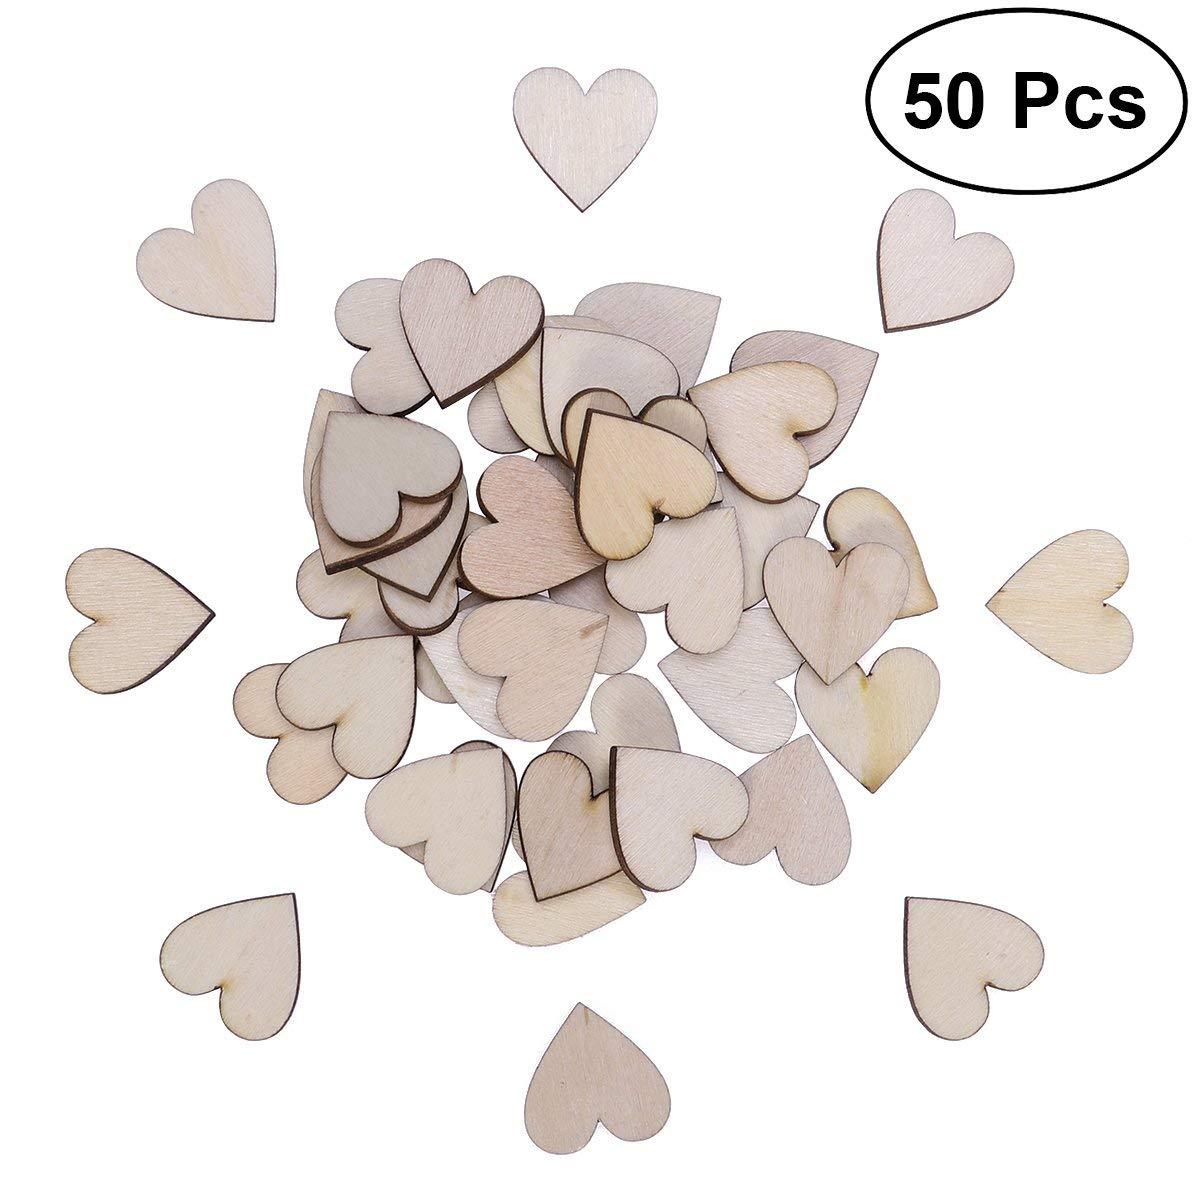 Vosarea 50PCS Heart Shaped Wooden Slices Unpainted Natural Birch Tree Cutout Shape Discs for DIY Crafts Embellishments Wedding - 20mm